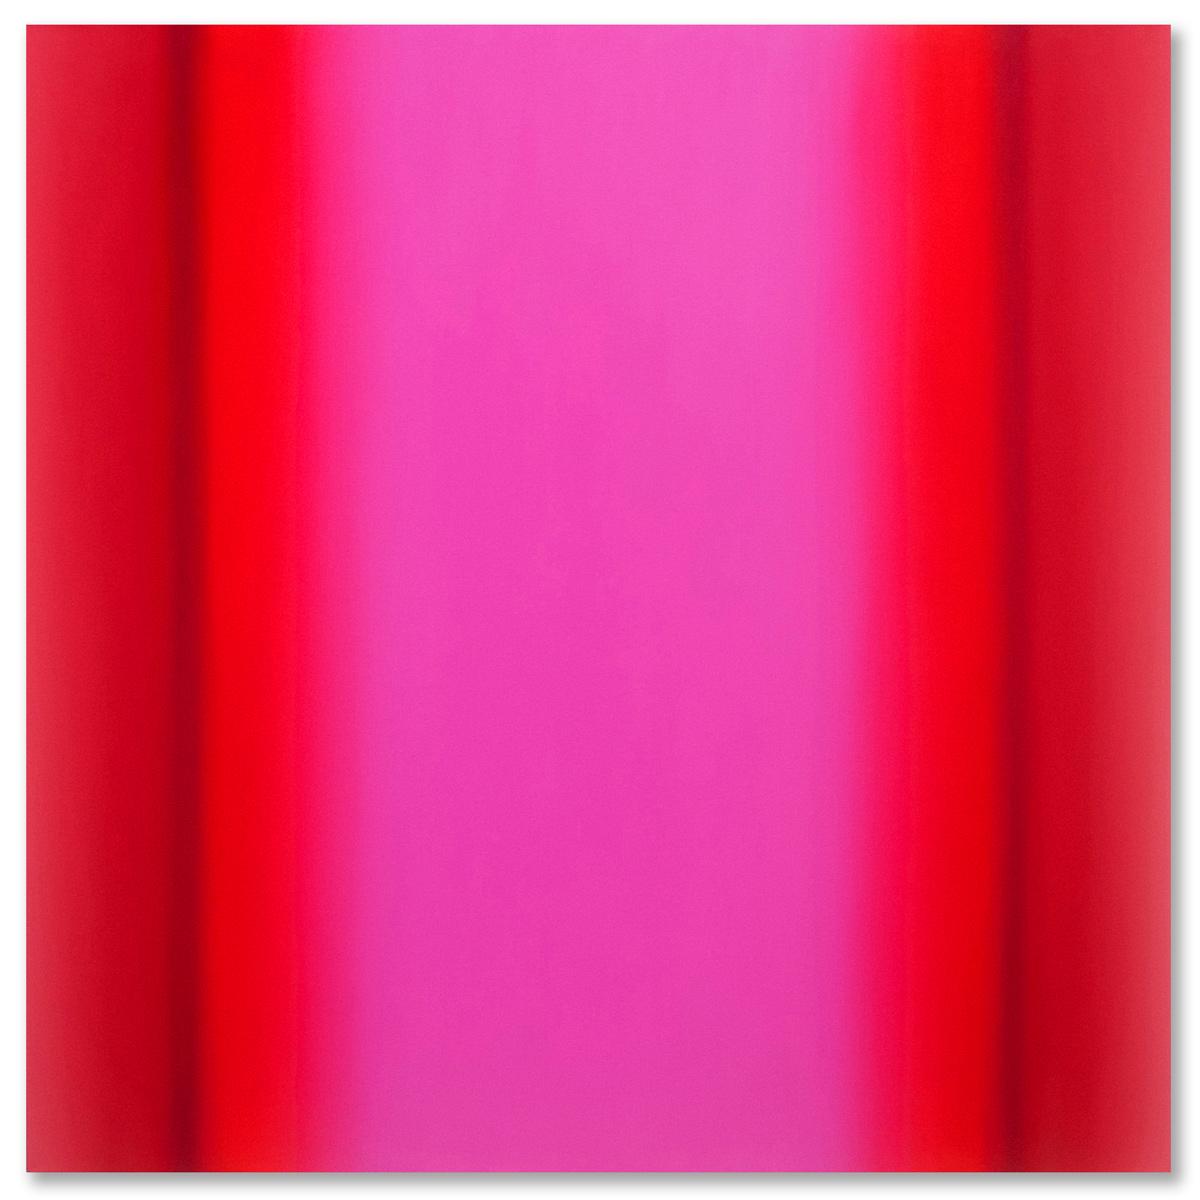 Matter of Light 14-S4848 (Red Magenta), Matter of Light Series, 2016, oil on canvas on custom beveled stretcher, 48 x 48 x 3 in. (122 x 122 x 7 cm.)